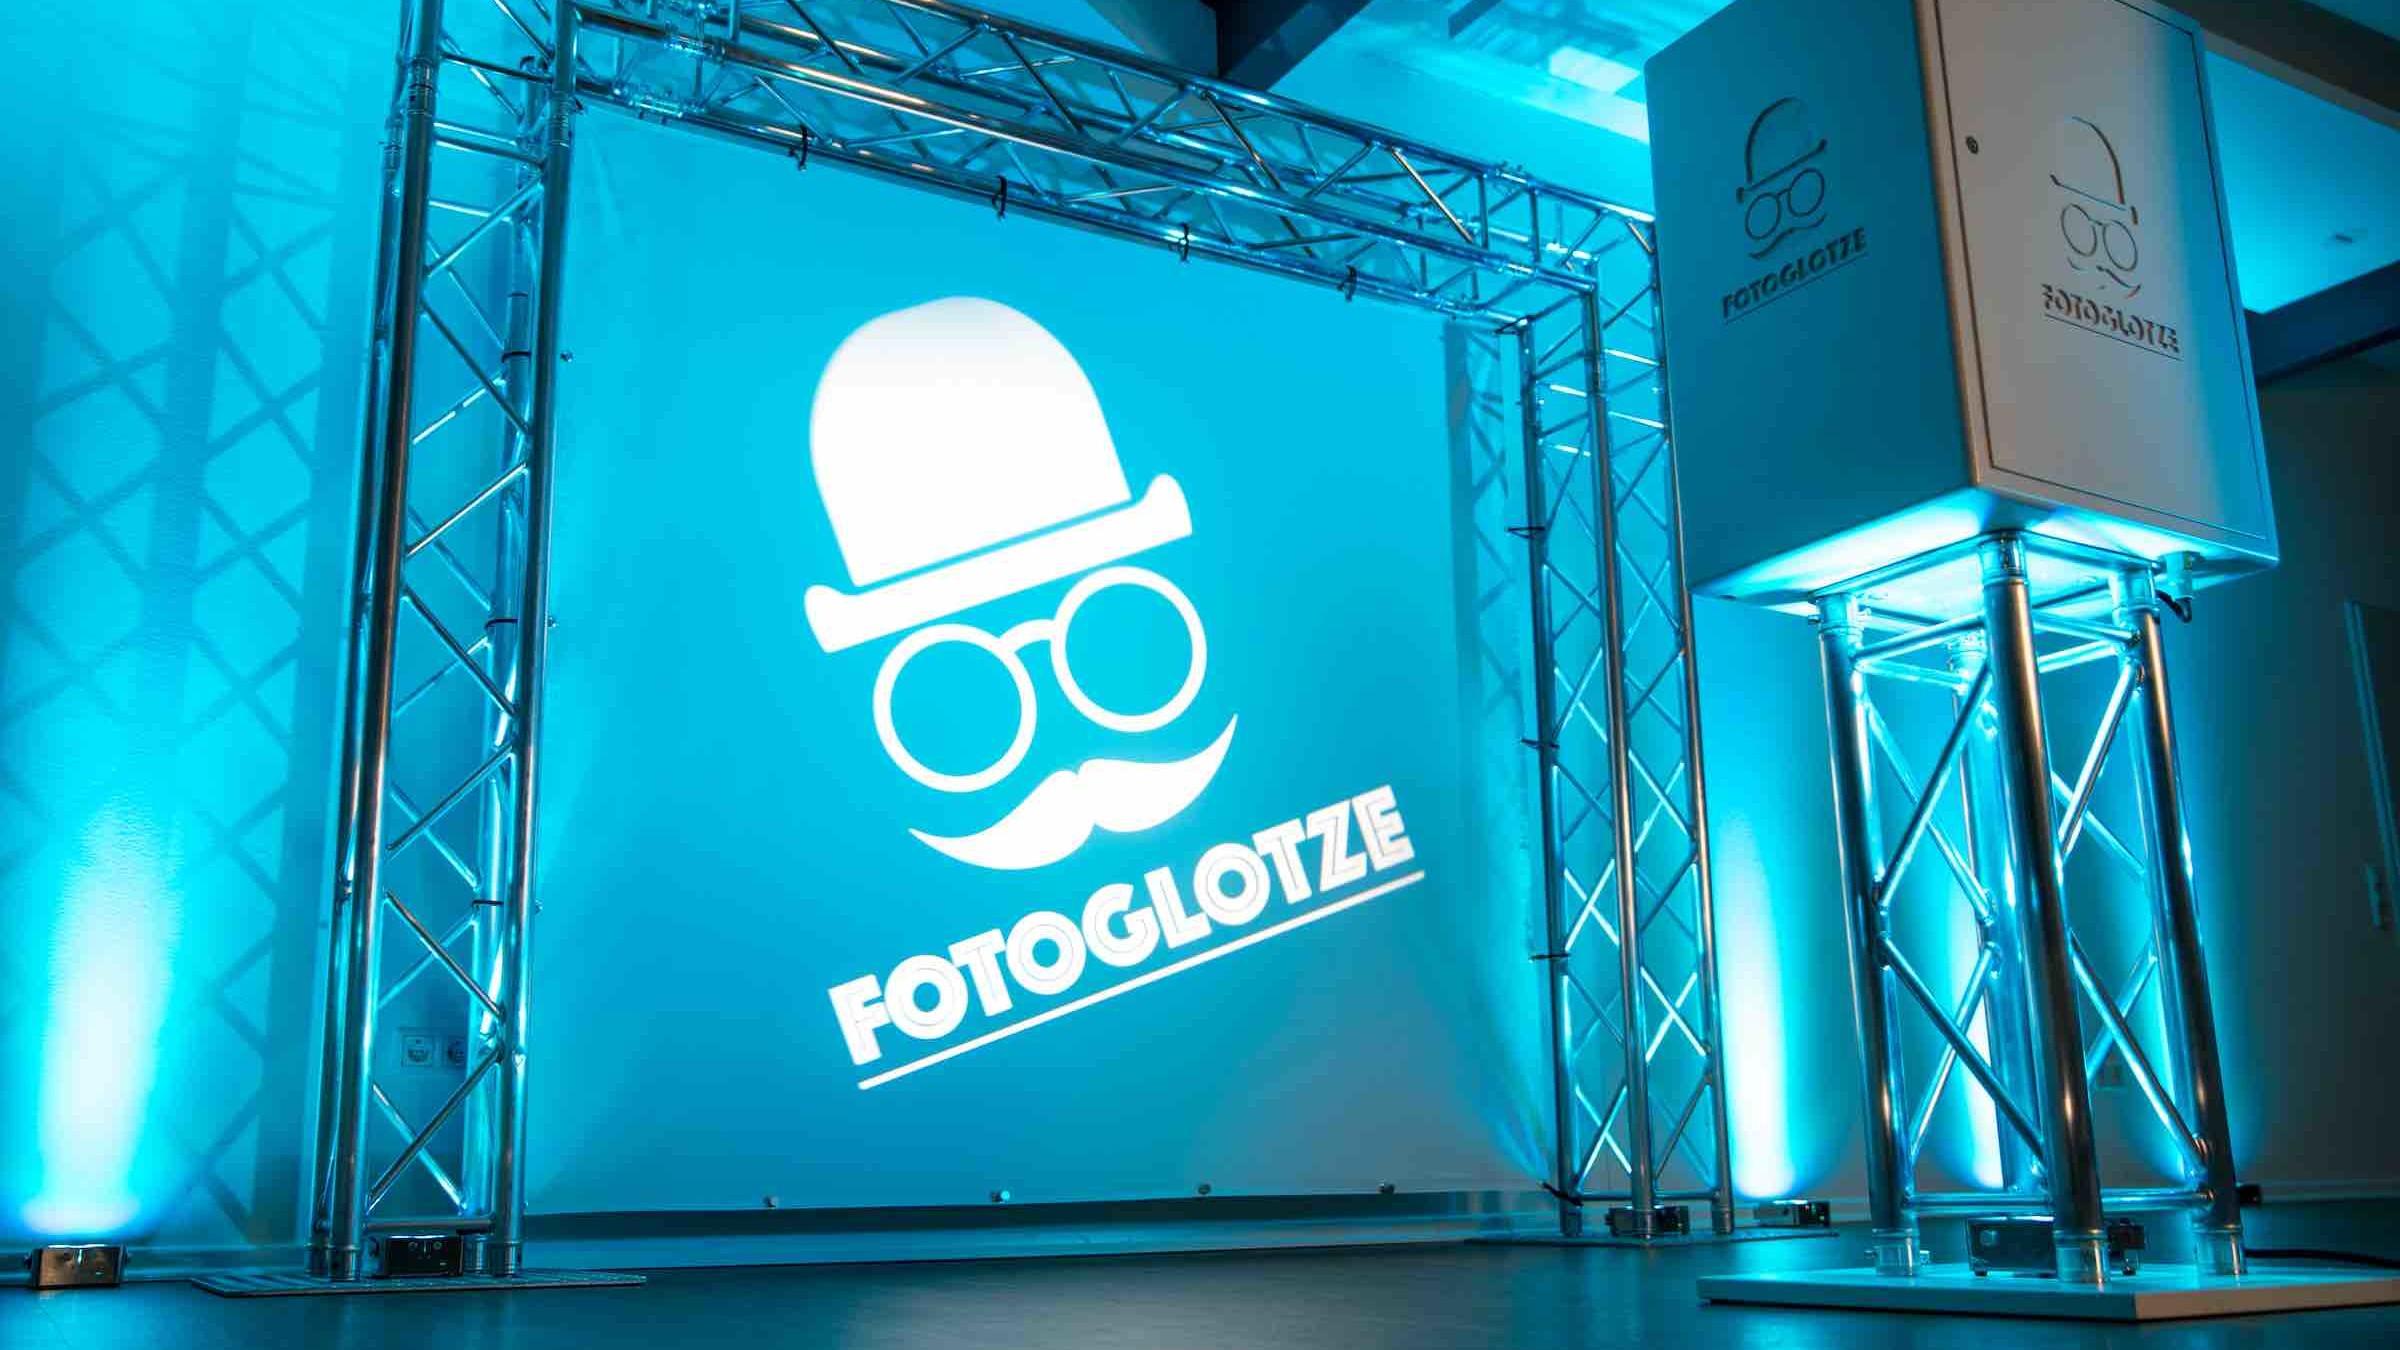 Glitzerplatte | Partner | Fotoglotze | Fotobox | Photobooth | Fotoautomat | Hannover | Mieten | Buchen | Anfragen